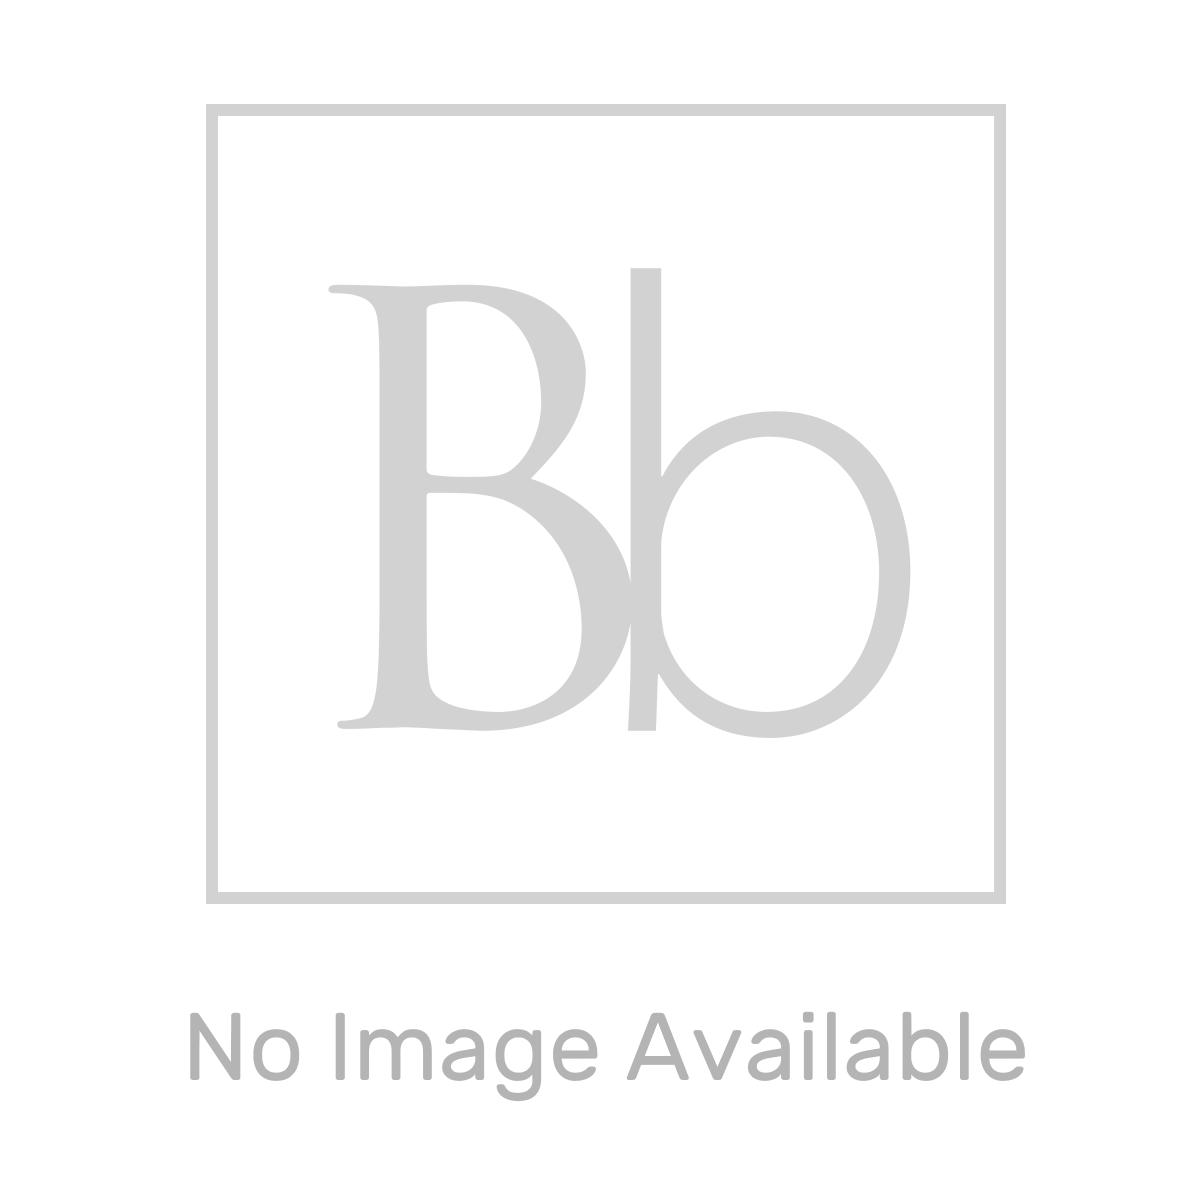 Sena Single Electric Horizontal Radiator 550 x 1185mm in Black Detail